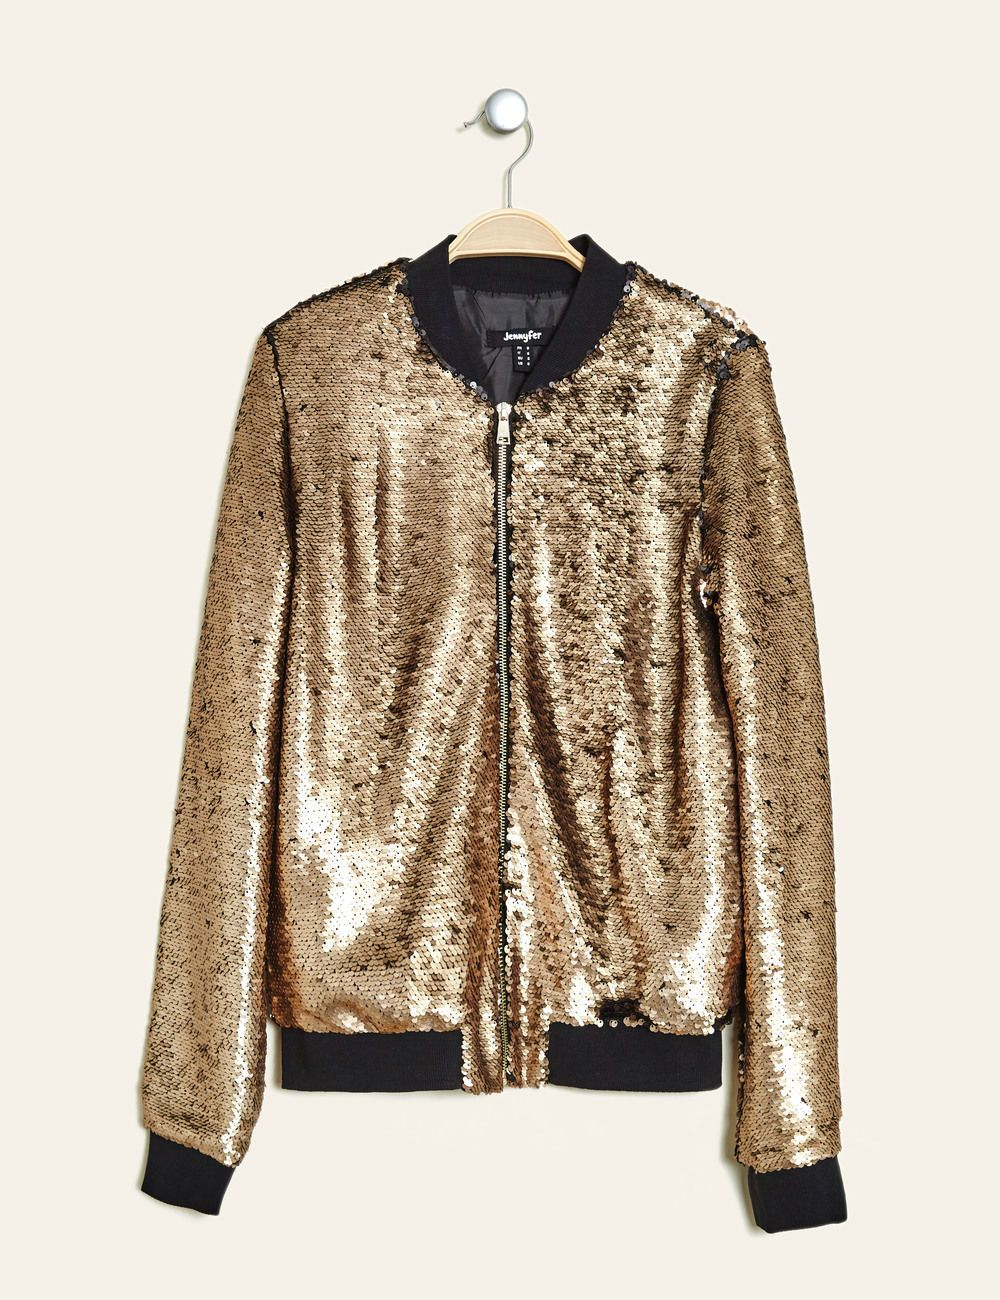 Sequins Réversibles Bomber En • Doré Femme Jennyfer 2019 Shopping dzxw6RqZ